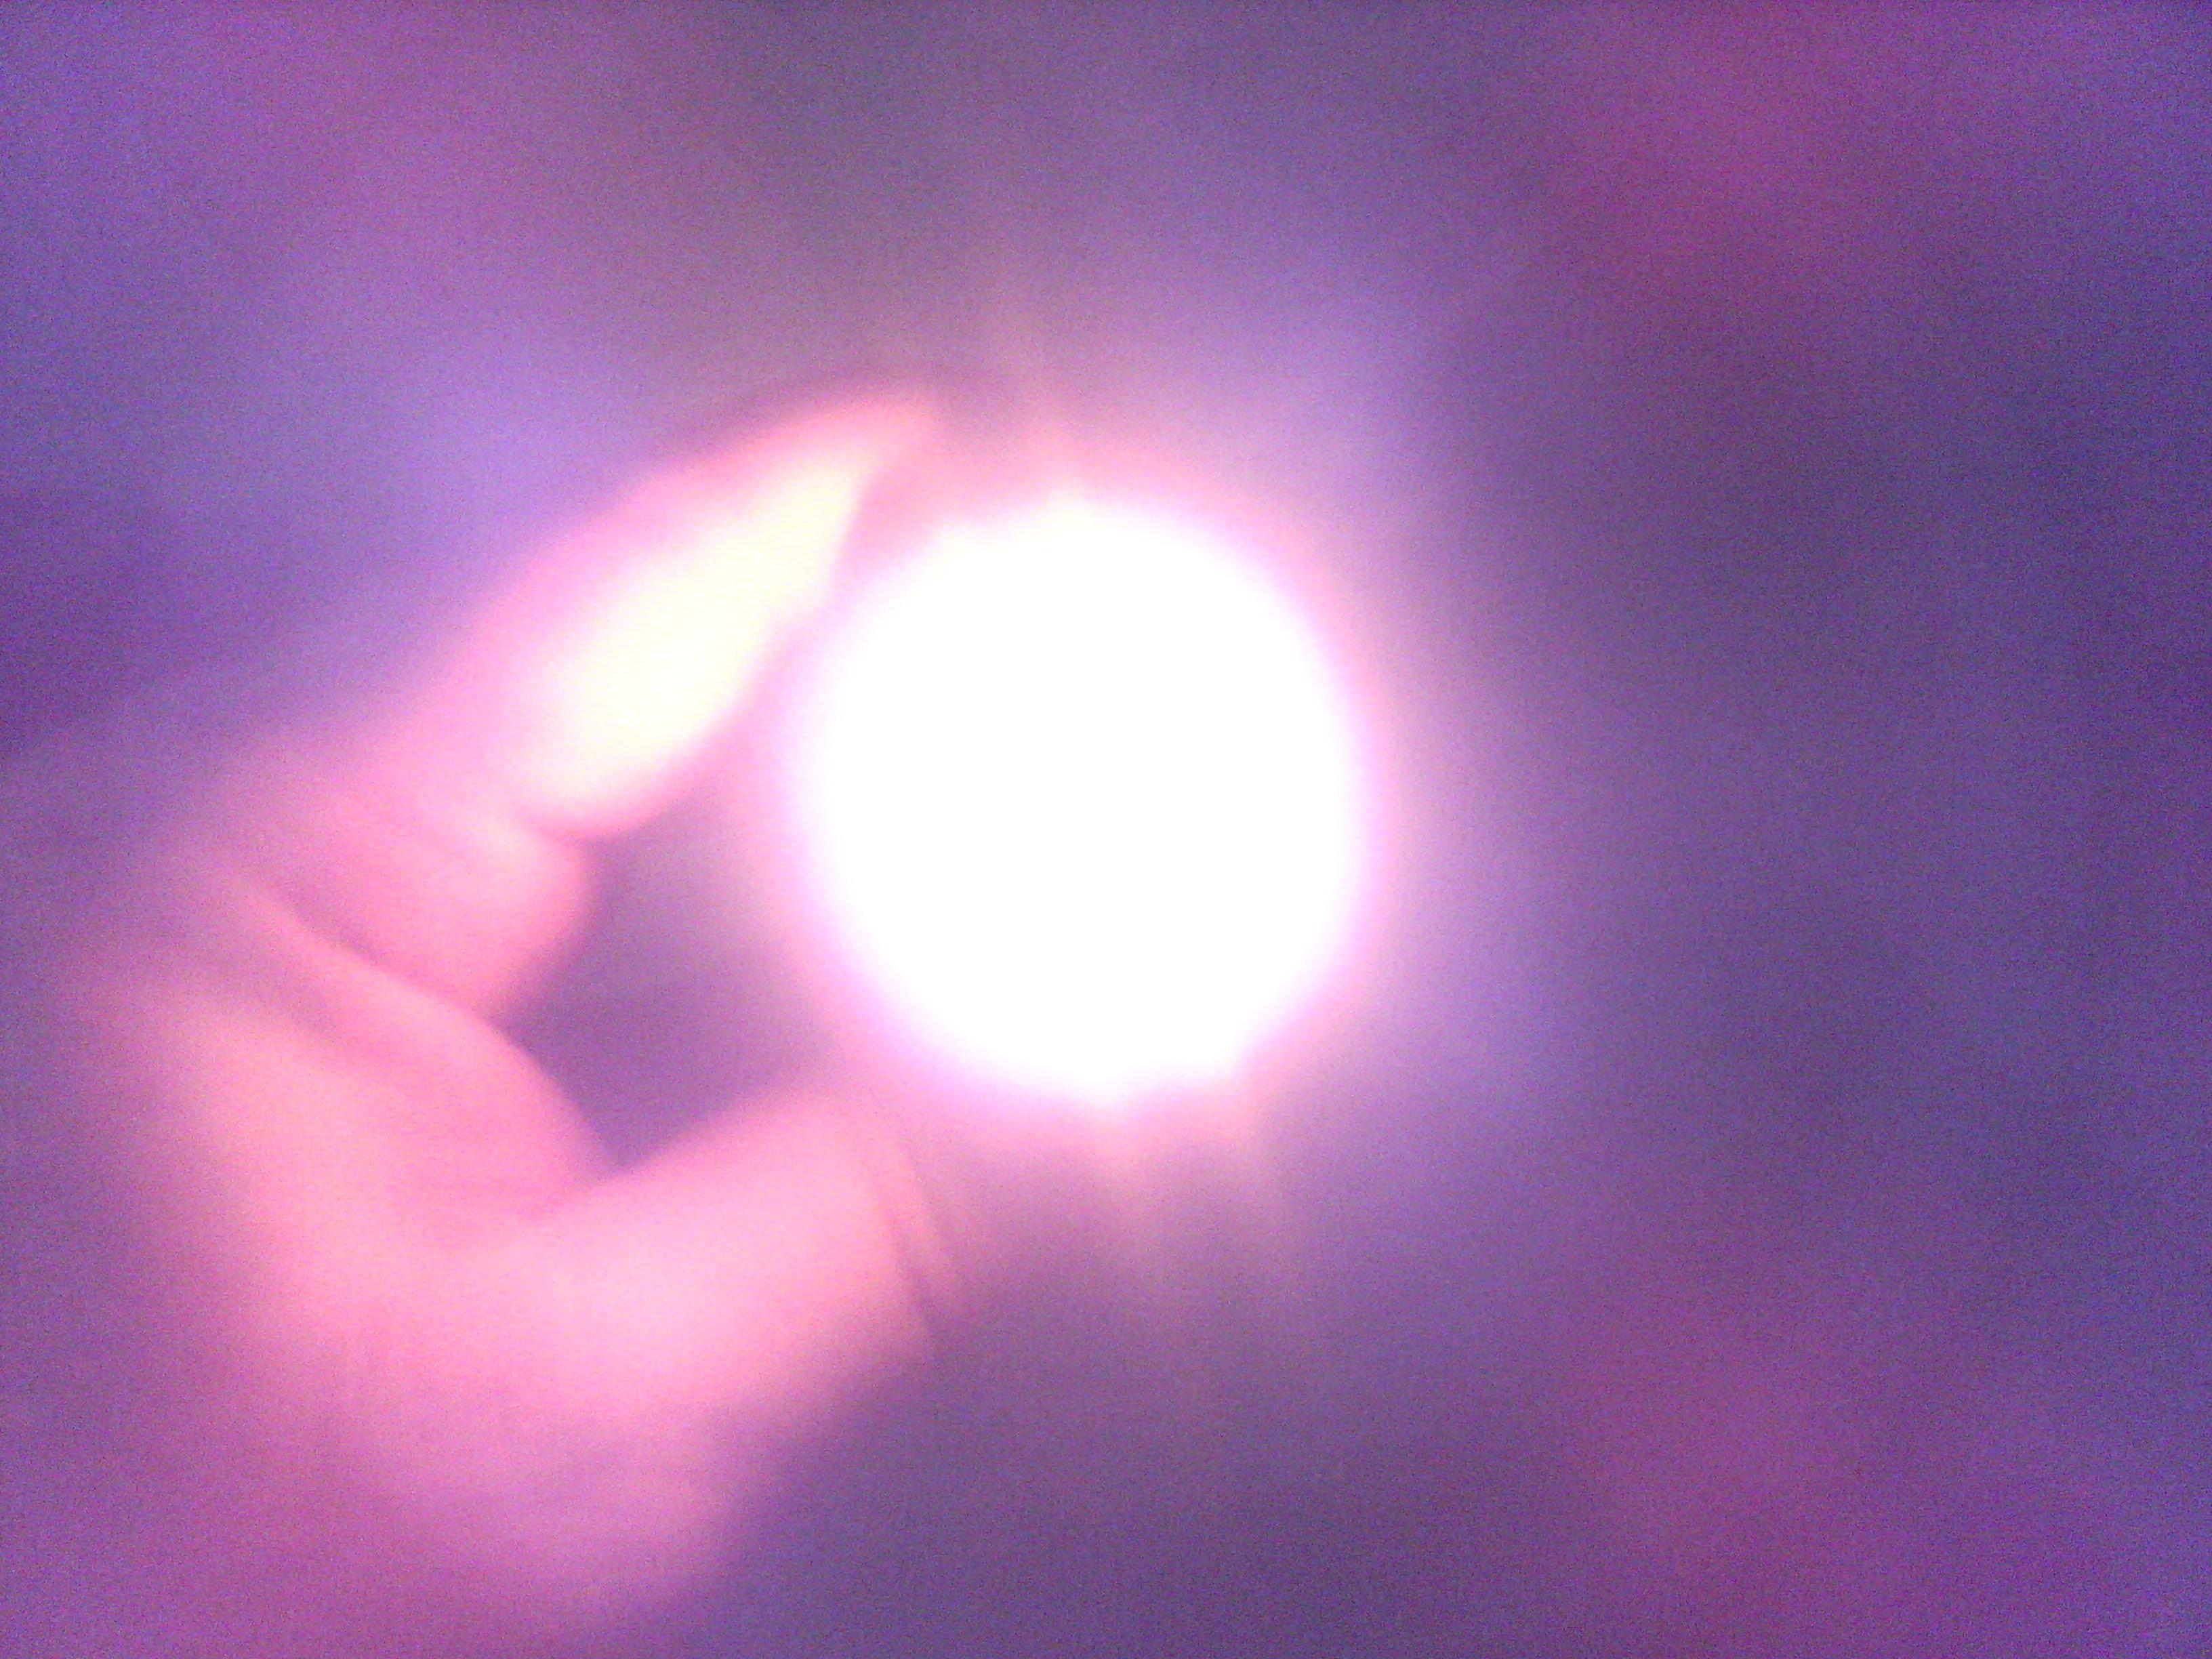 maschendraht glühbirne